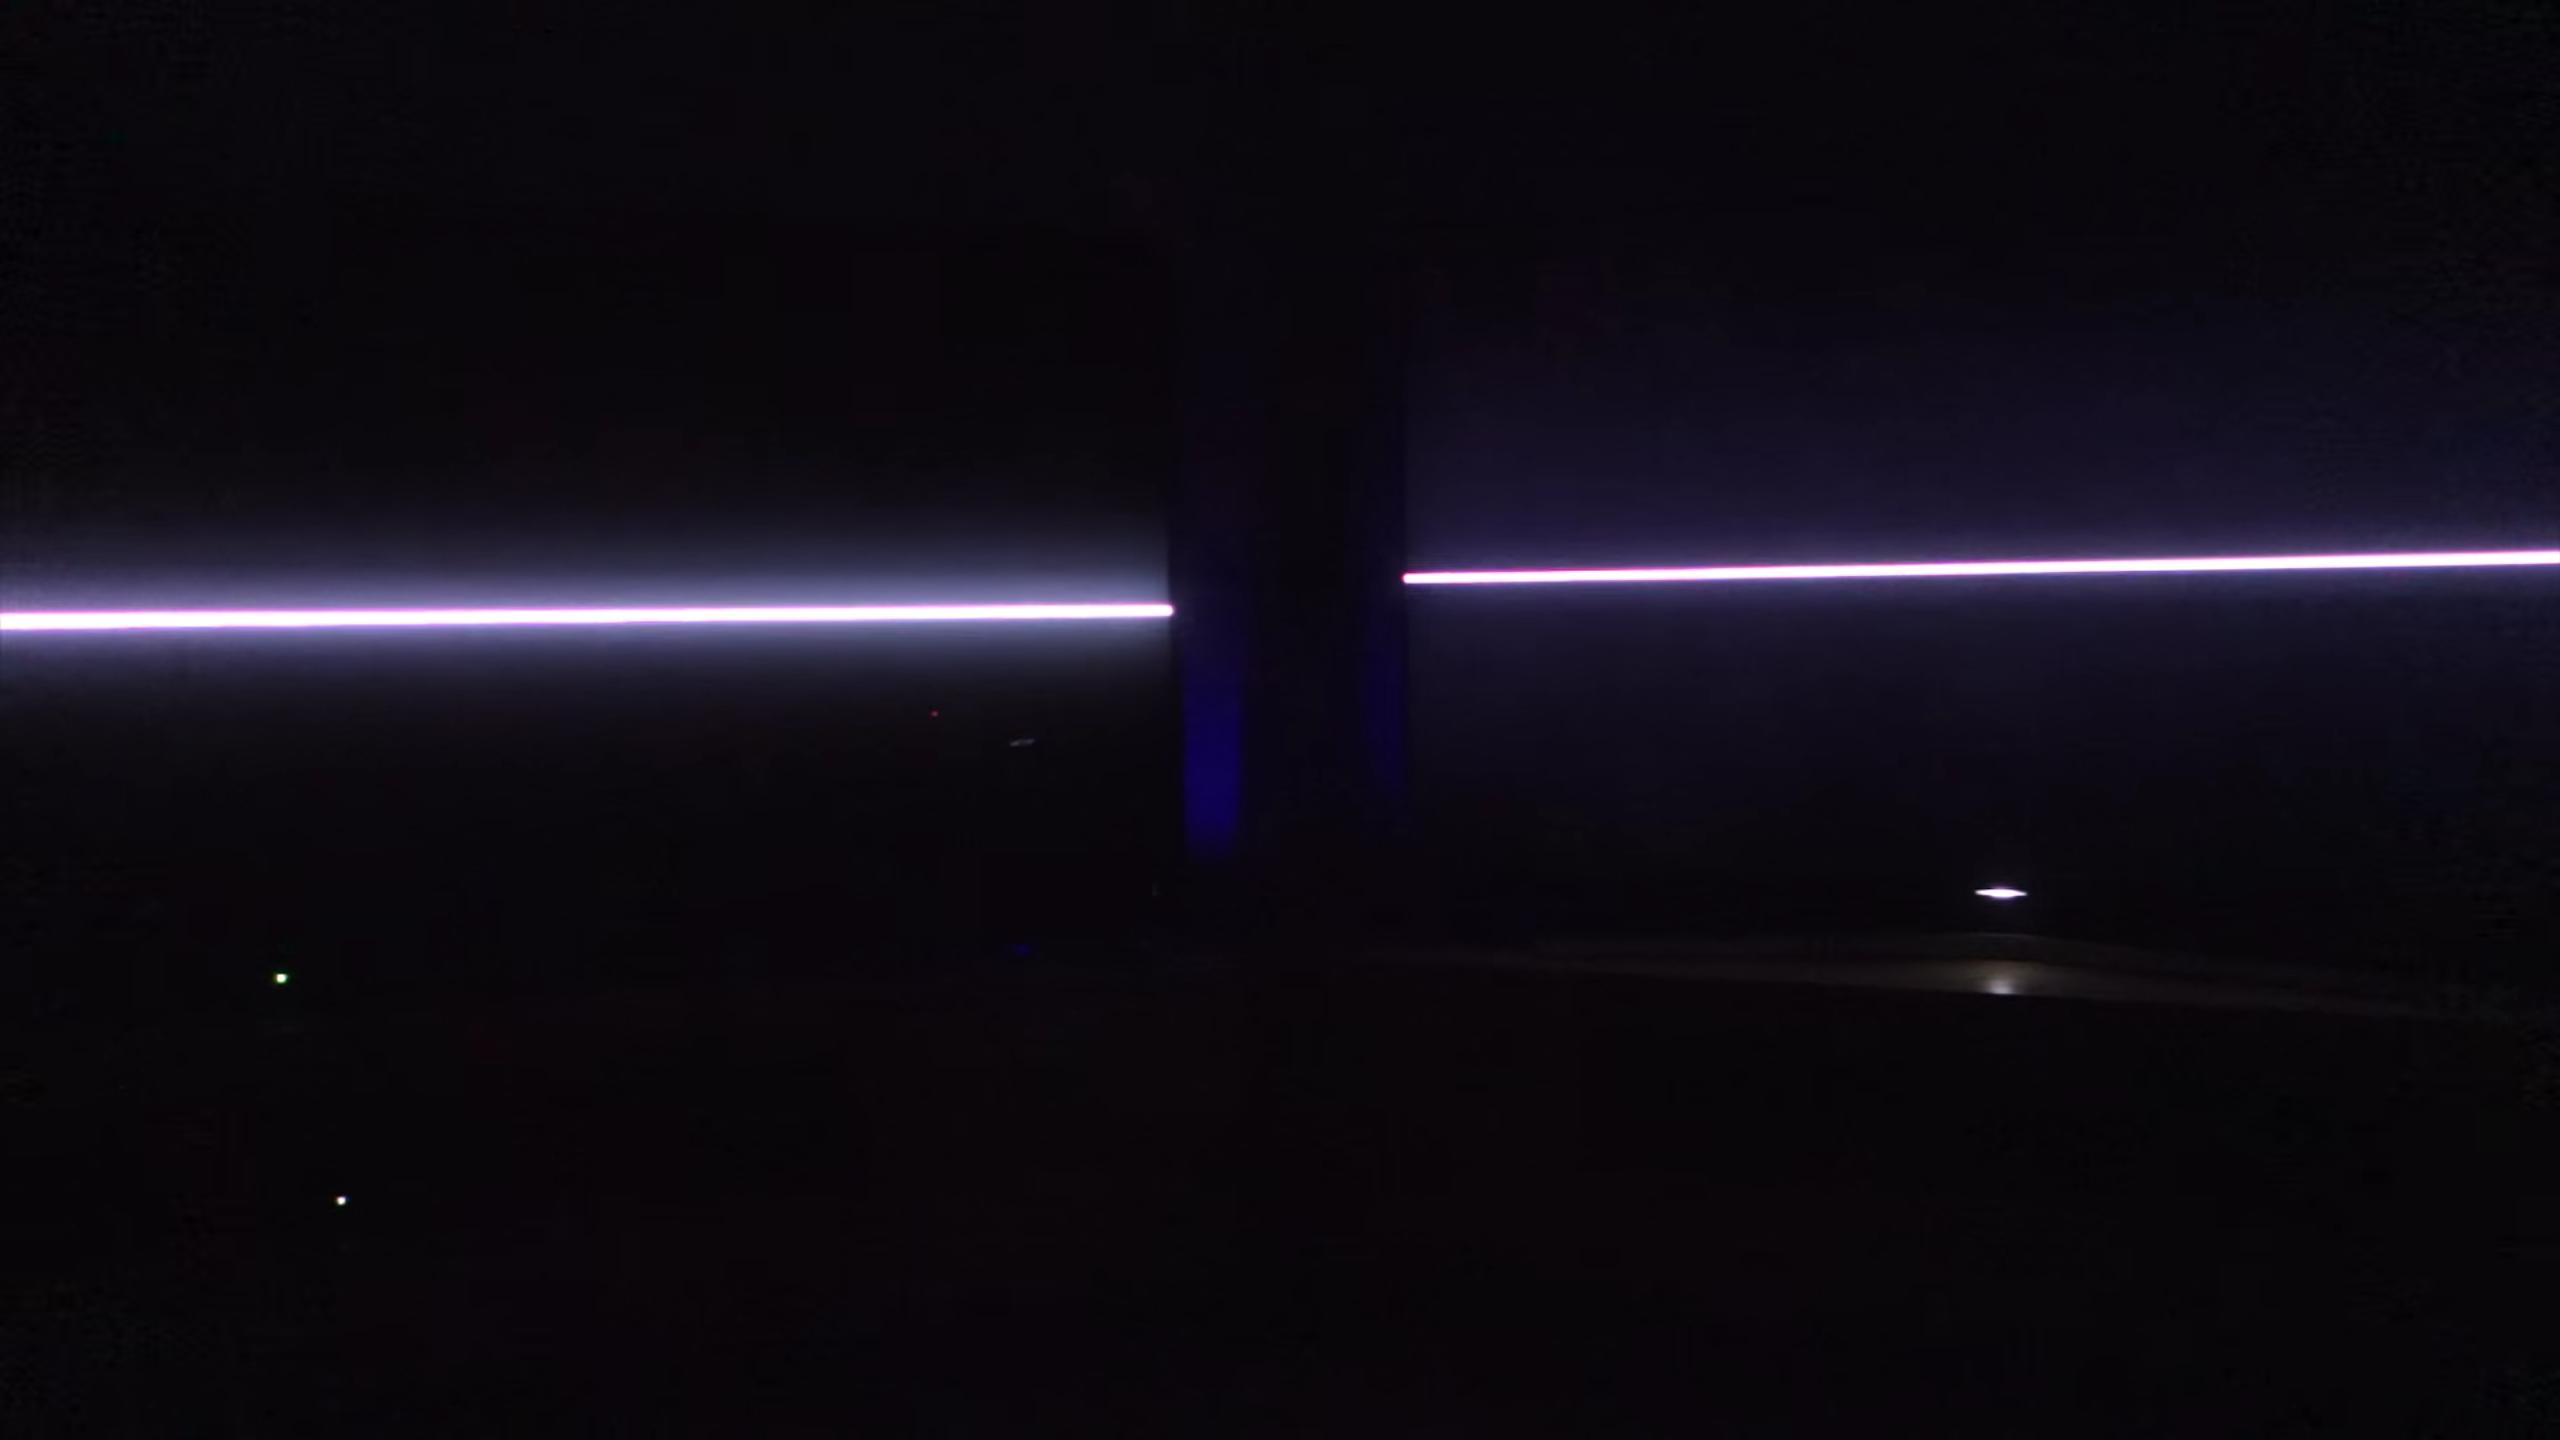 Screenshot_٢٠١٦٠٧٠٧-٠٦٠١١٦[1]